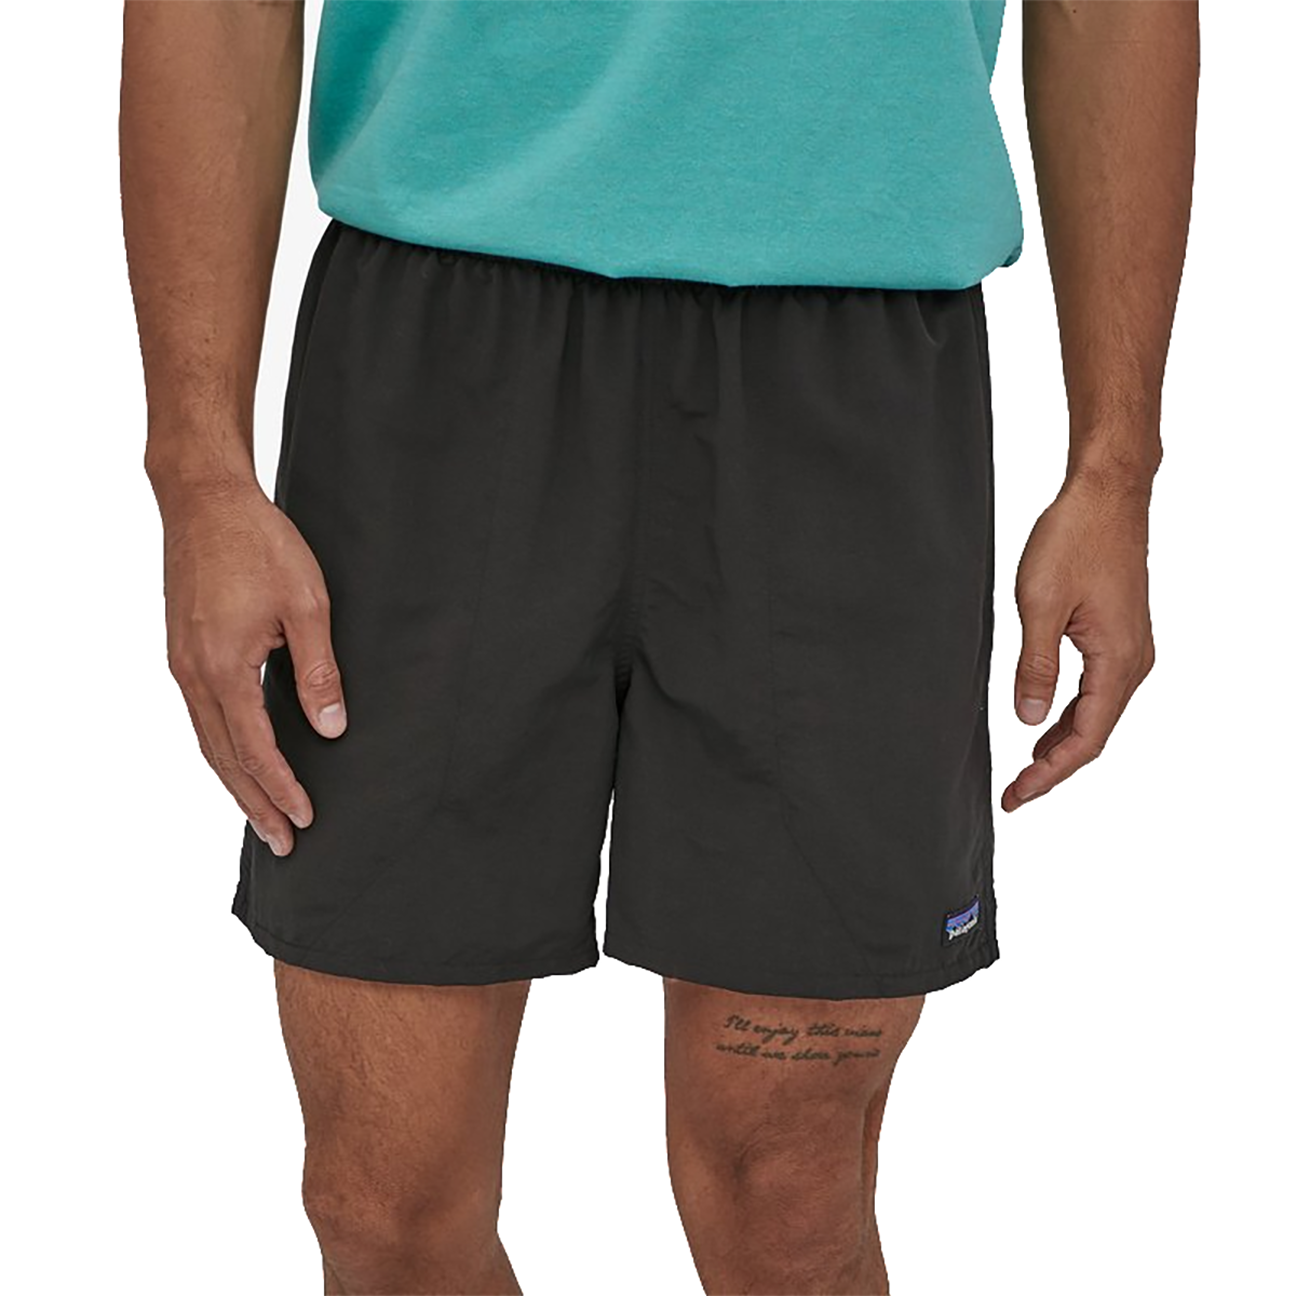 "Men's Baggies Shorts - 5"", Black-2"